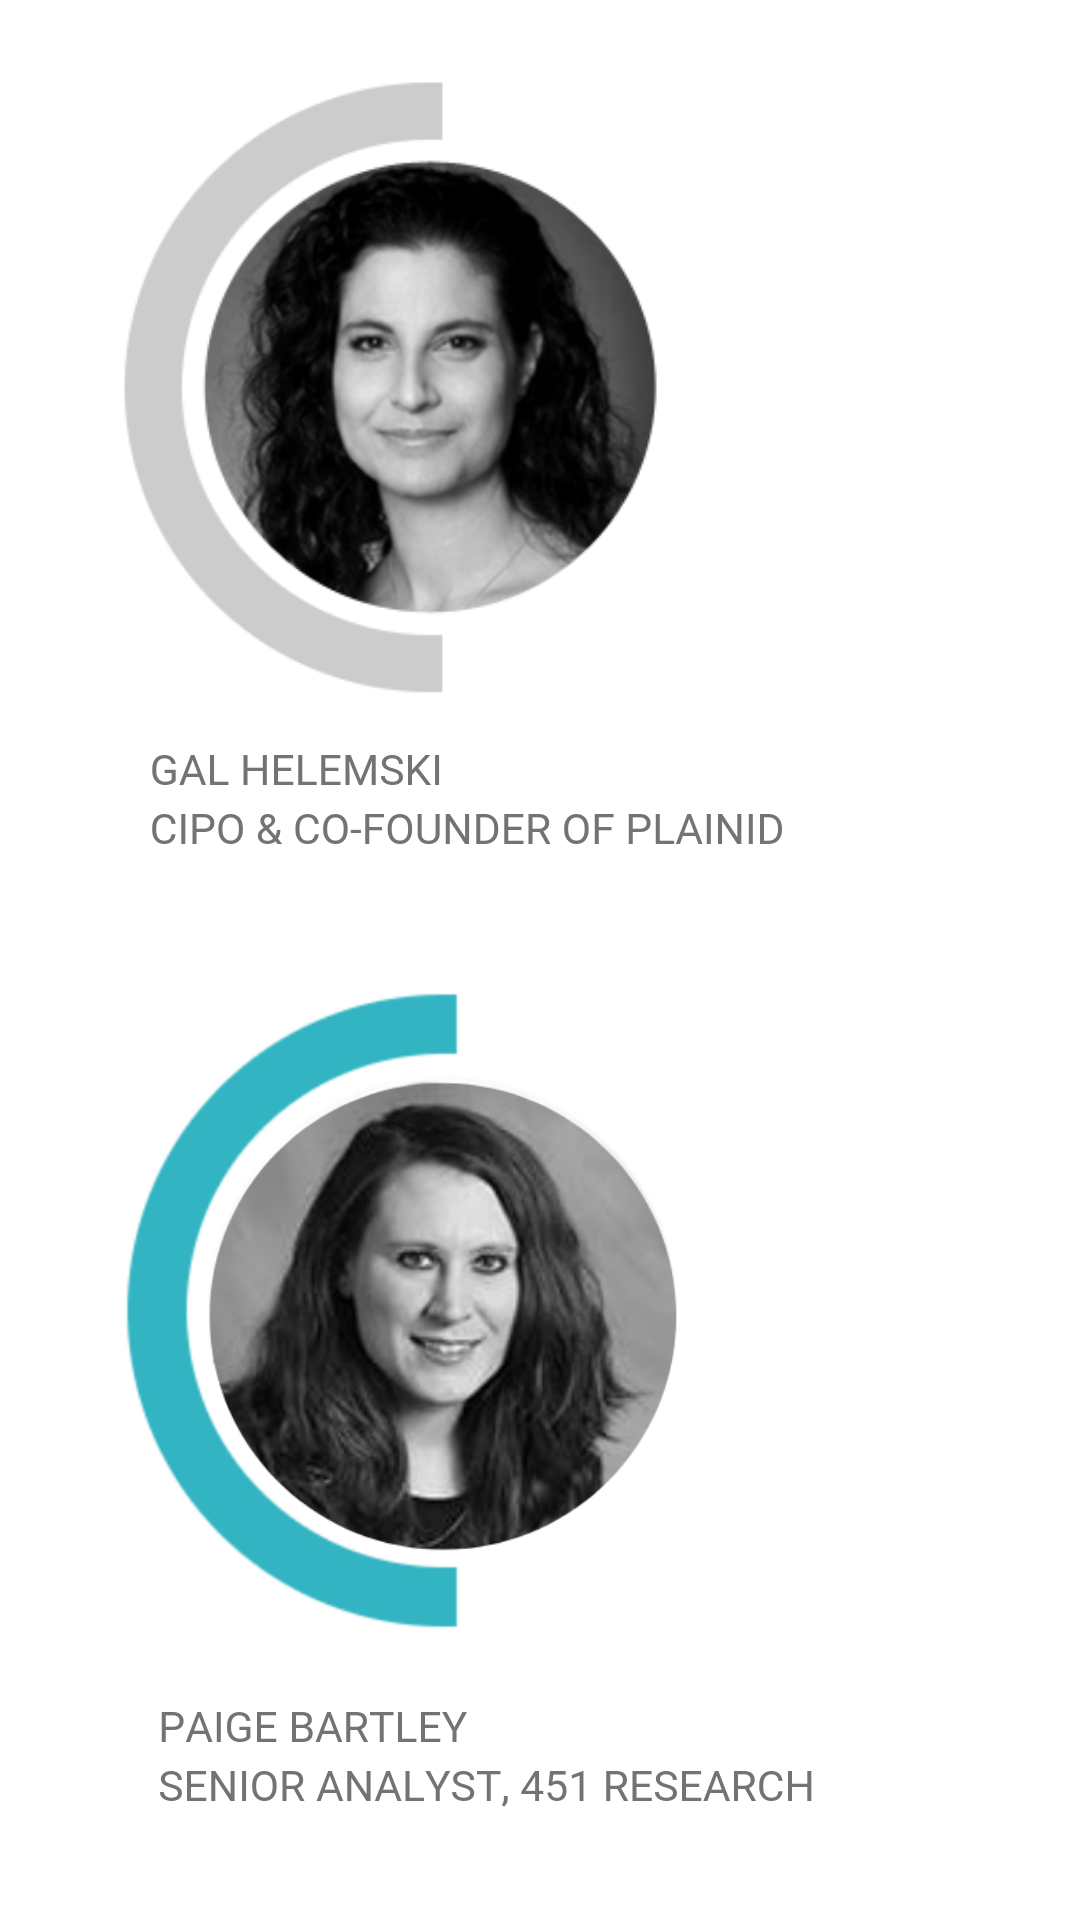 GAL HELEMSKI CIPO & CO-FOUNDER OF PLAINID